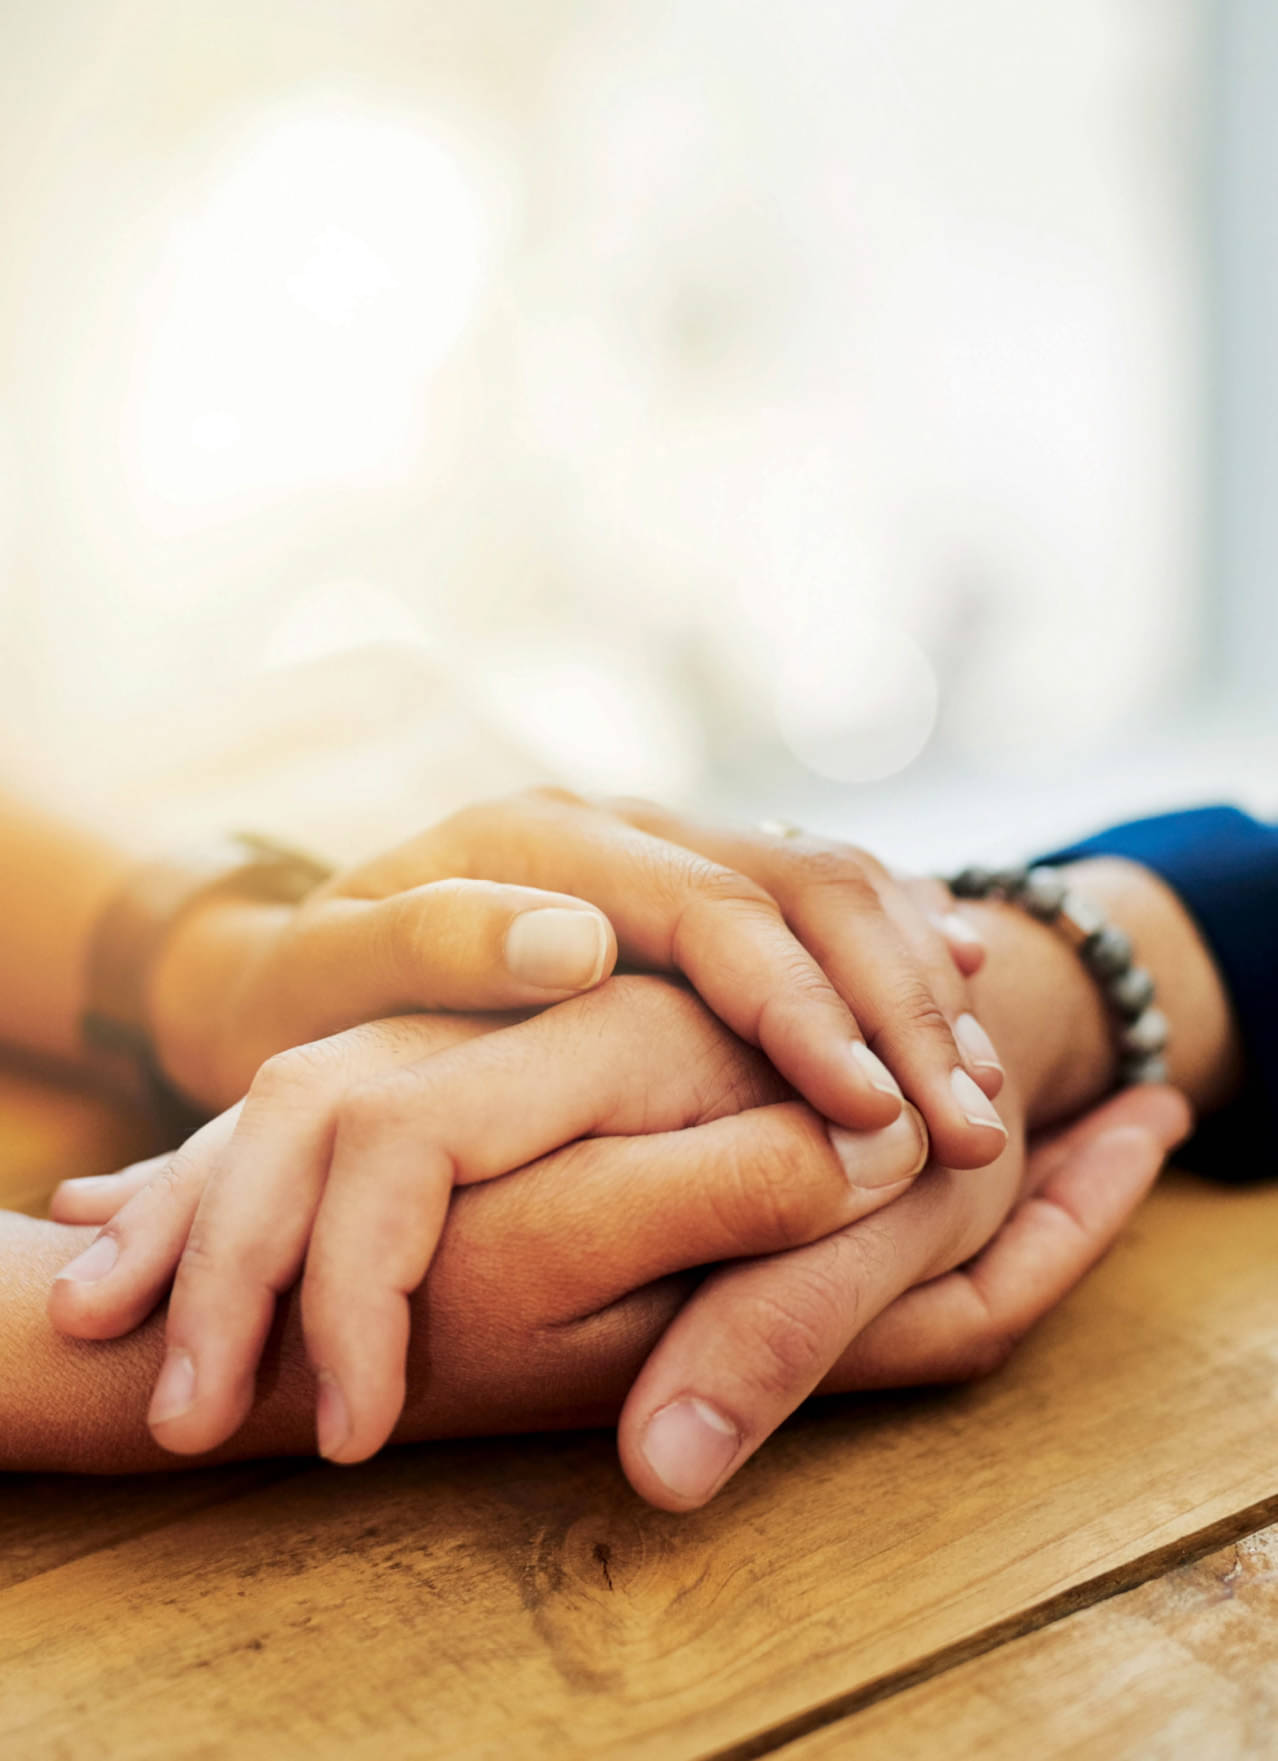 Helping A Friend Through A Break-Up